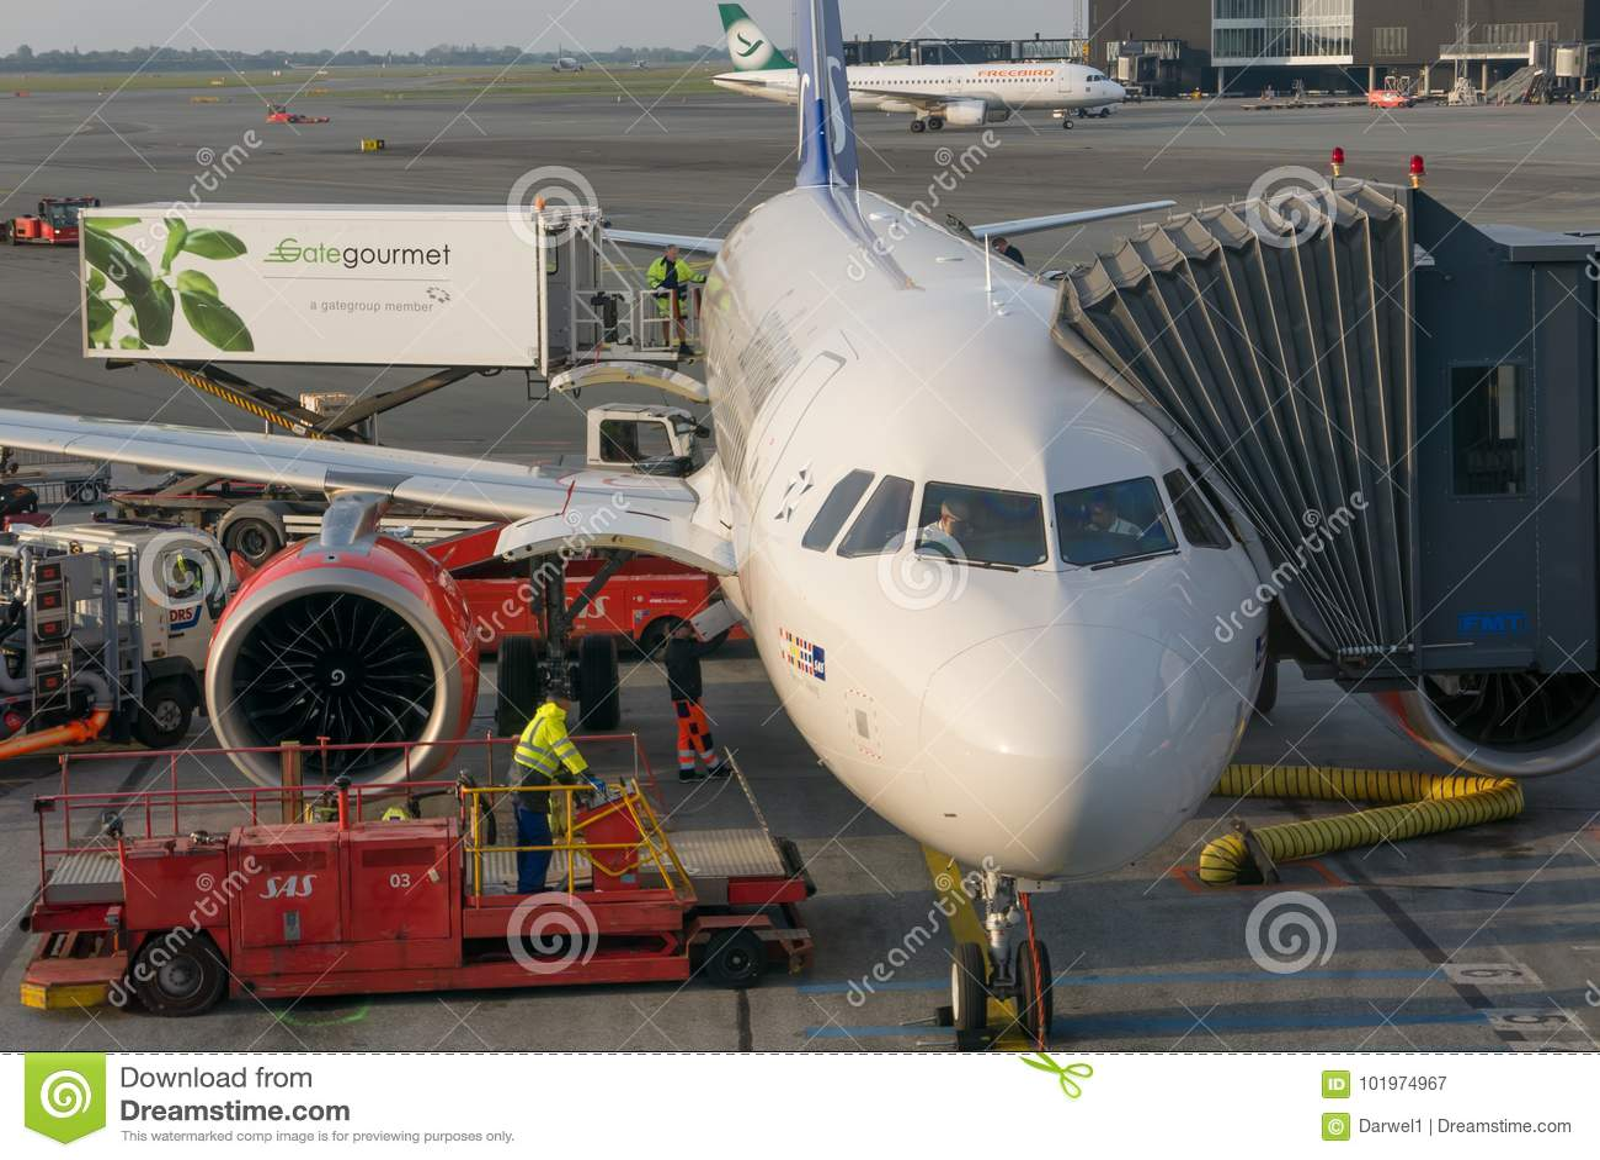 copenhagen-september-aircraft-pilots-preparing-to-flight-plane-undergoes-ground-handling-refueling-airplane-101974967.jpg